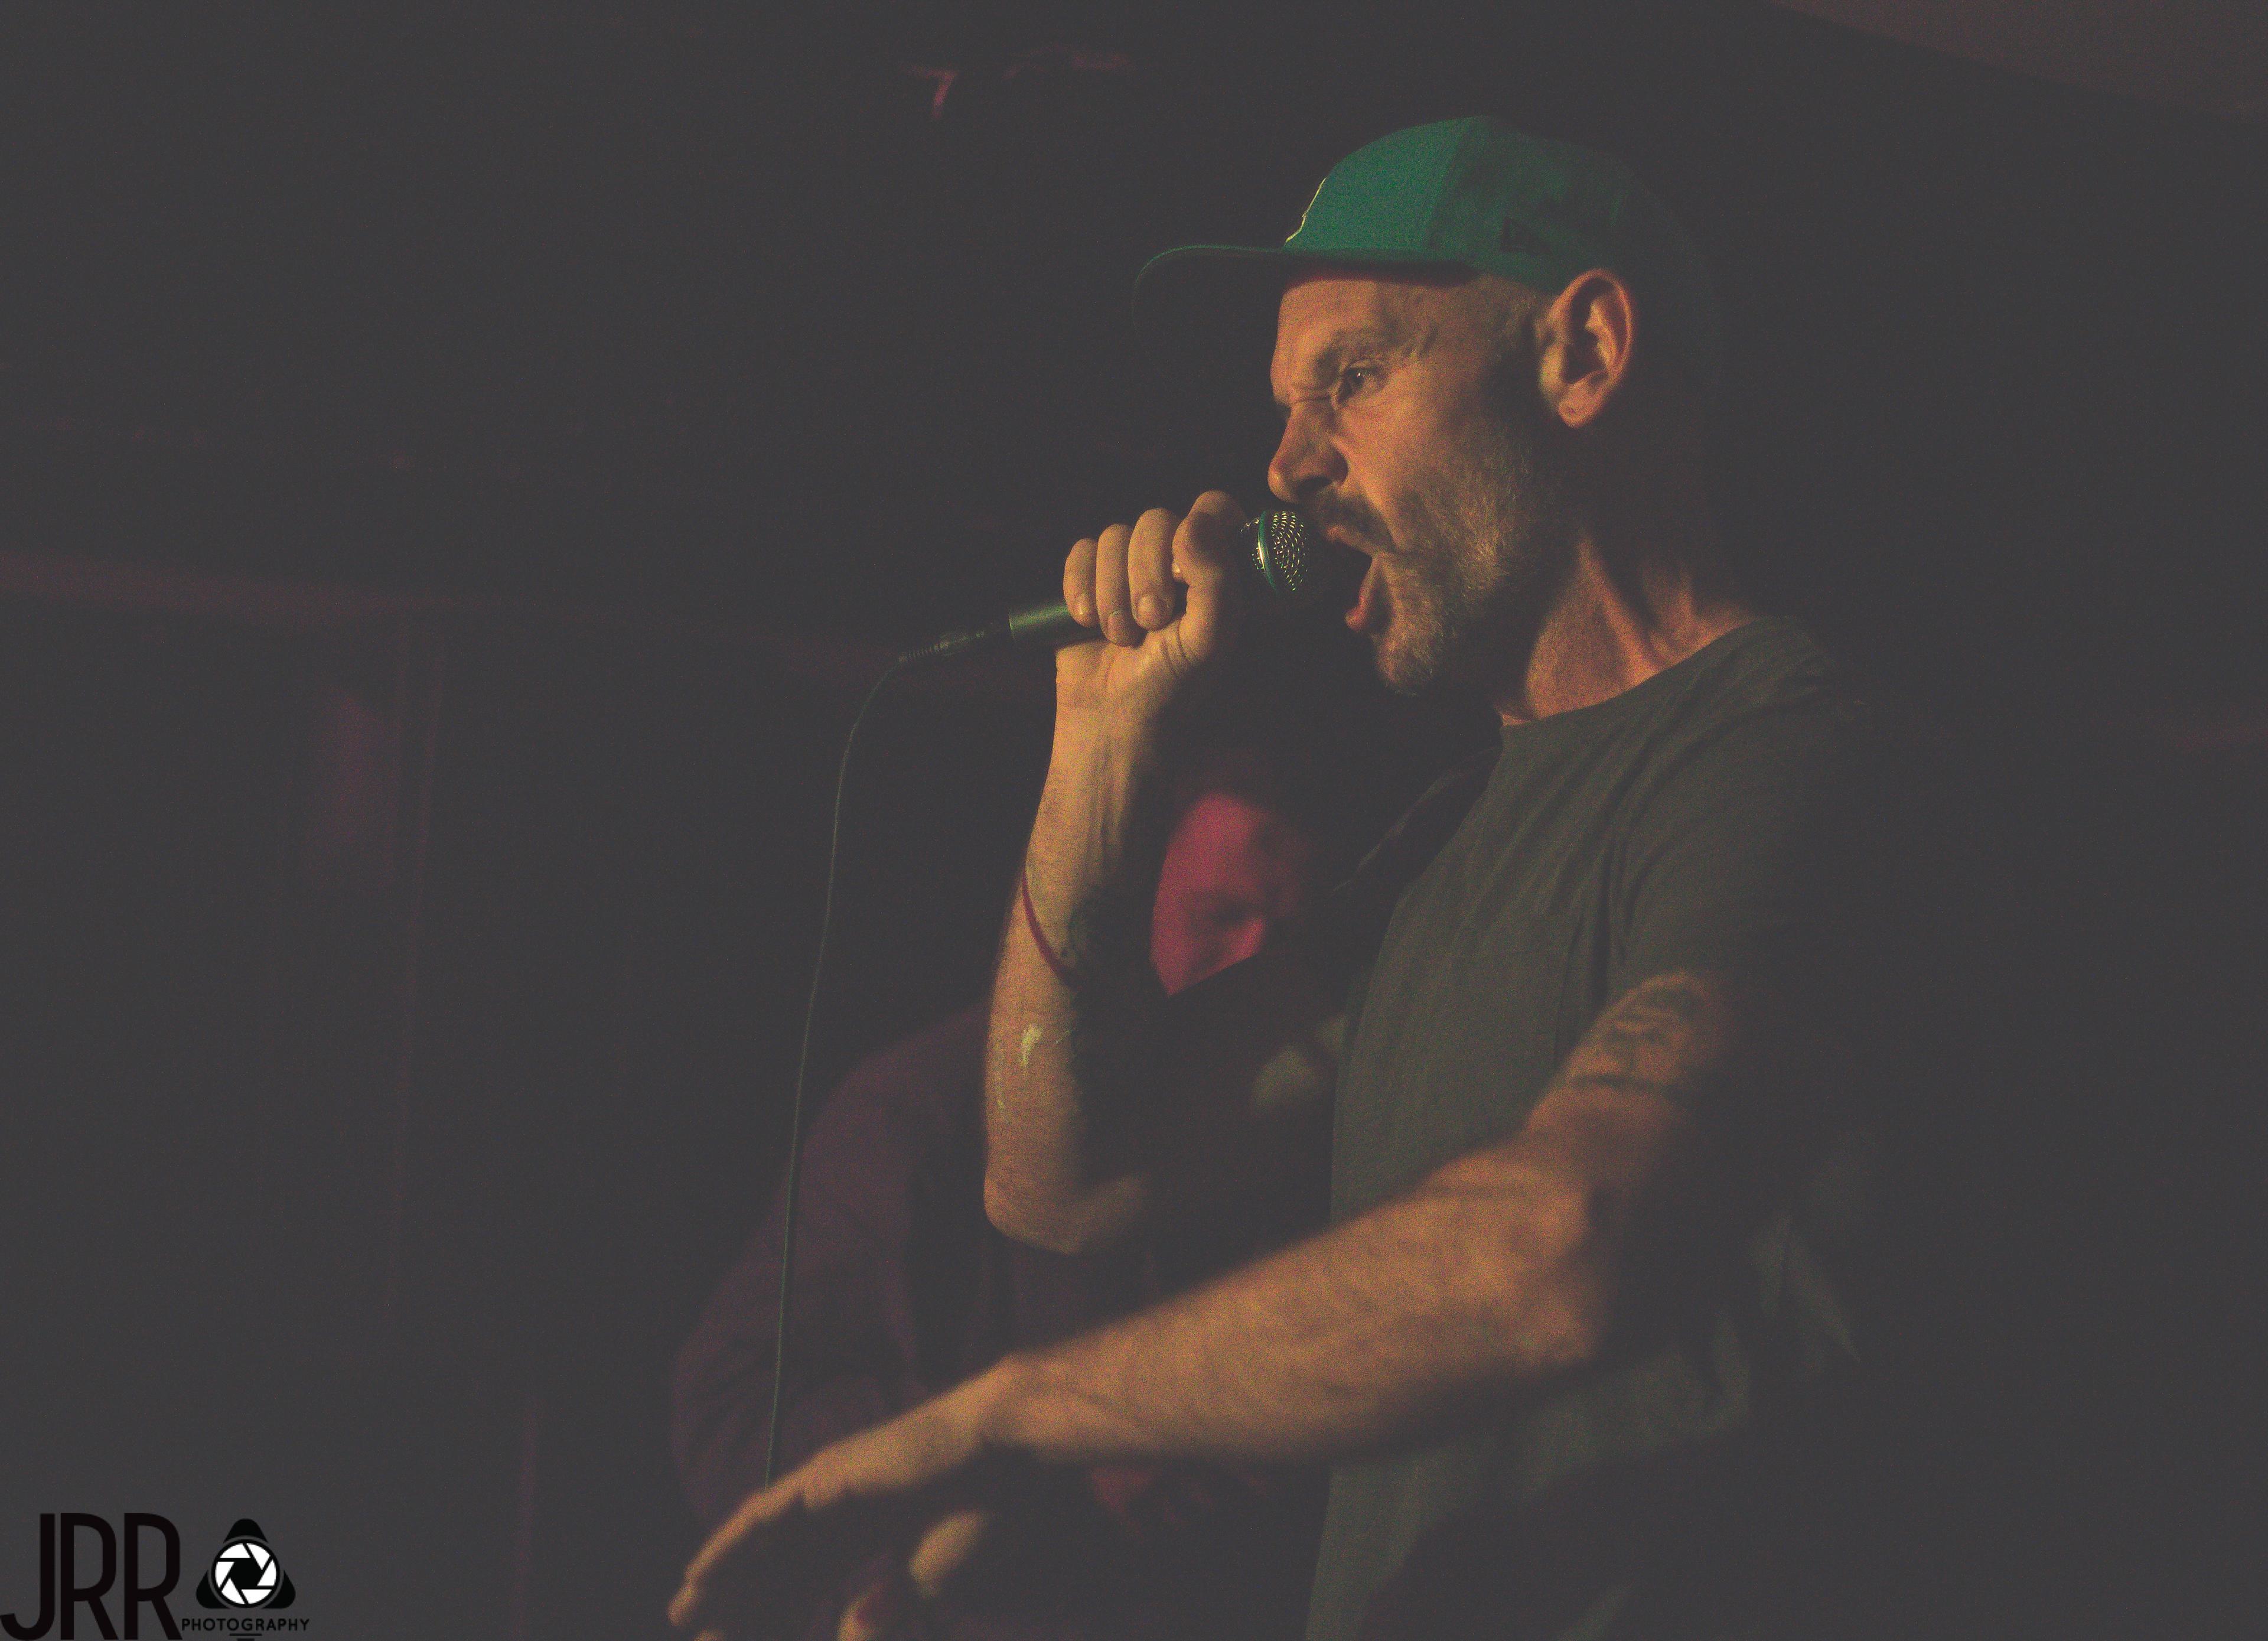 John Robinson - Hip Hop music gig